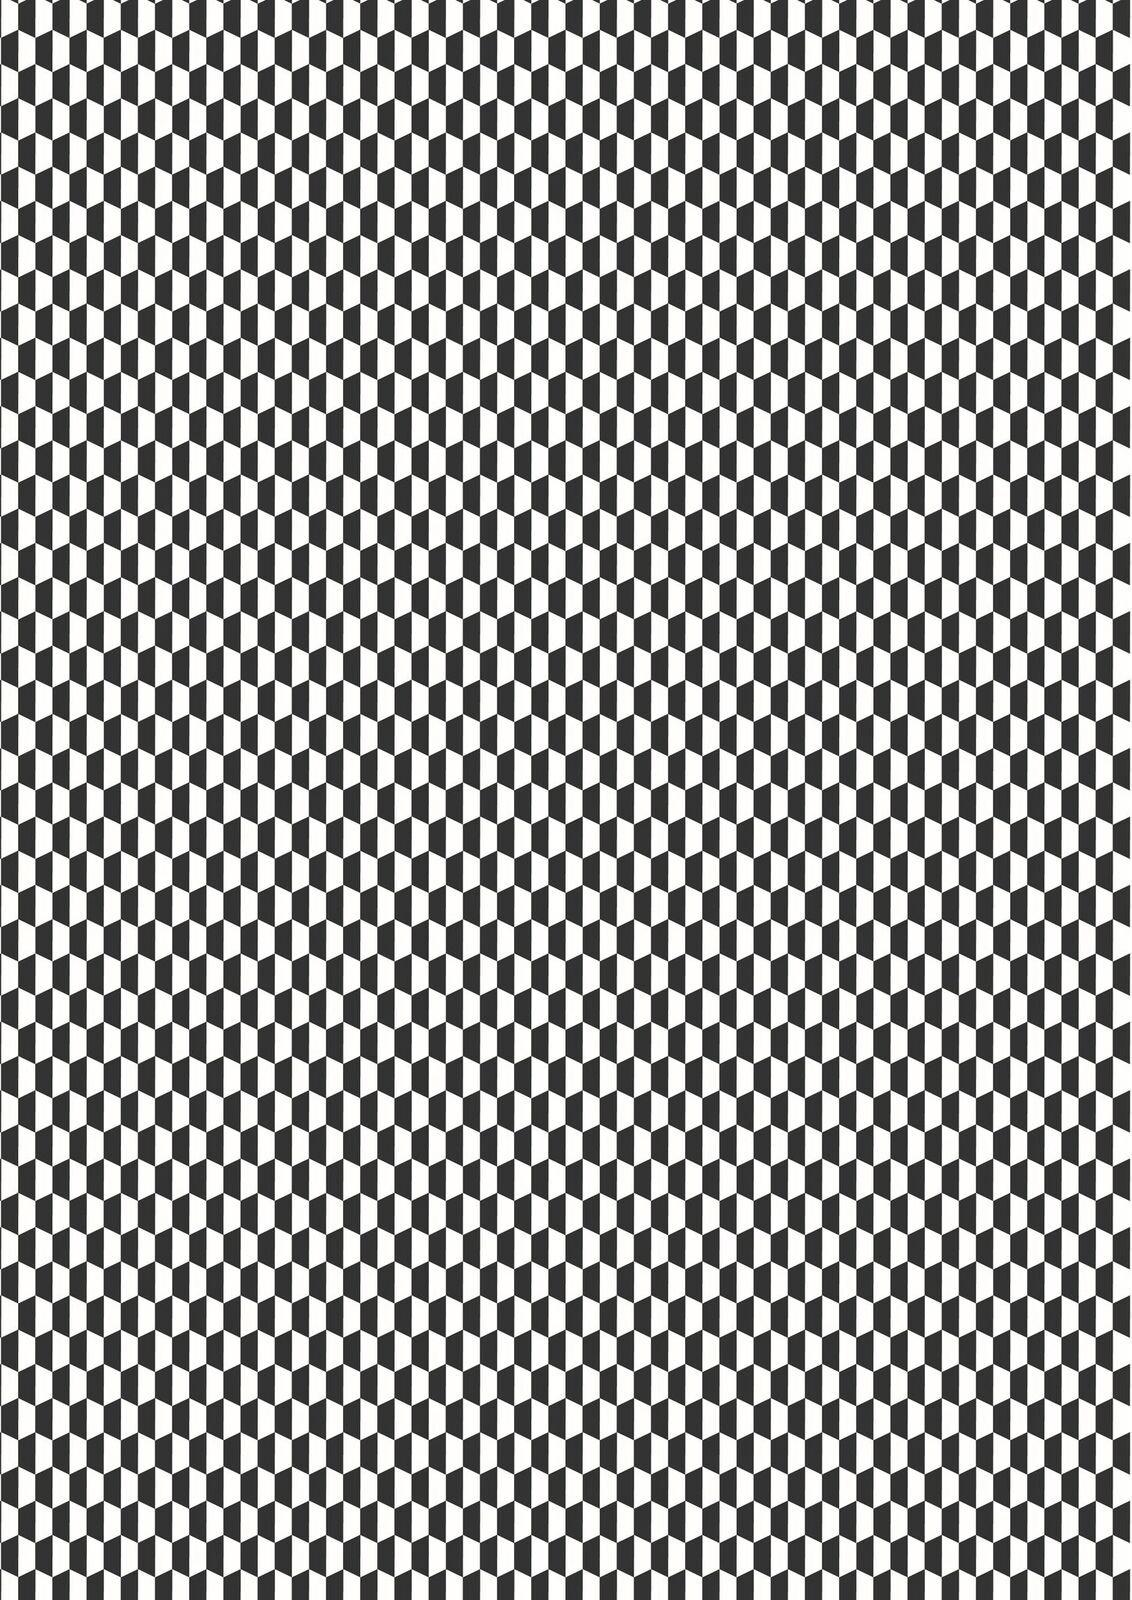 Lewis & Irene Geometrix - Black/White Hex- GX4.1